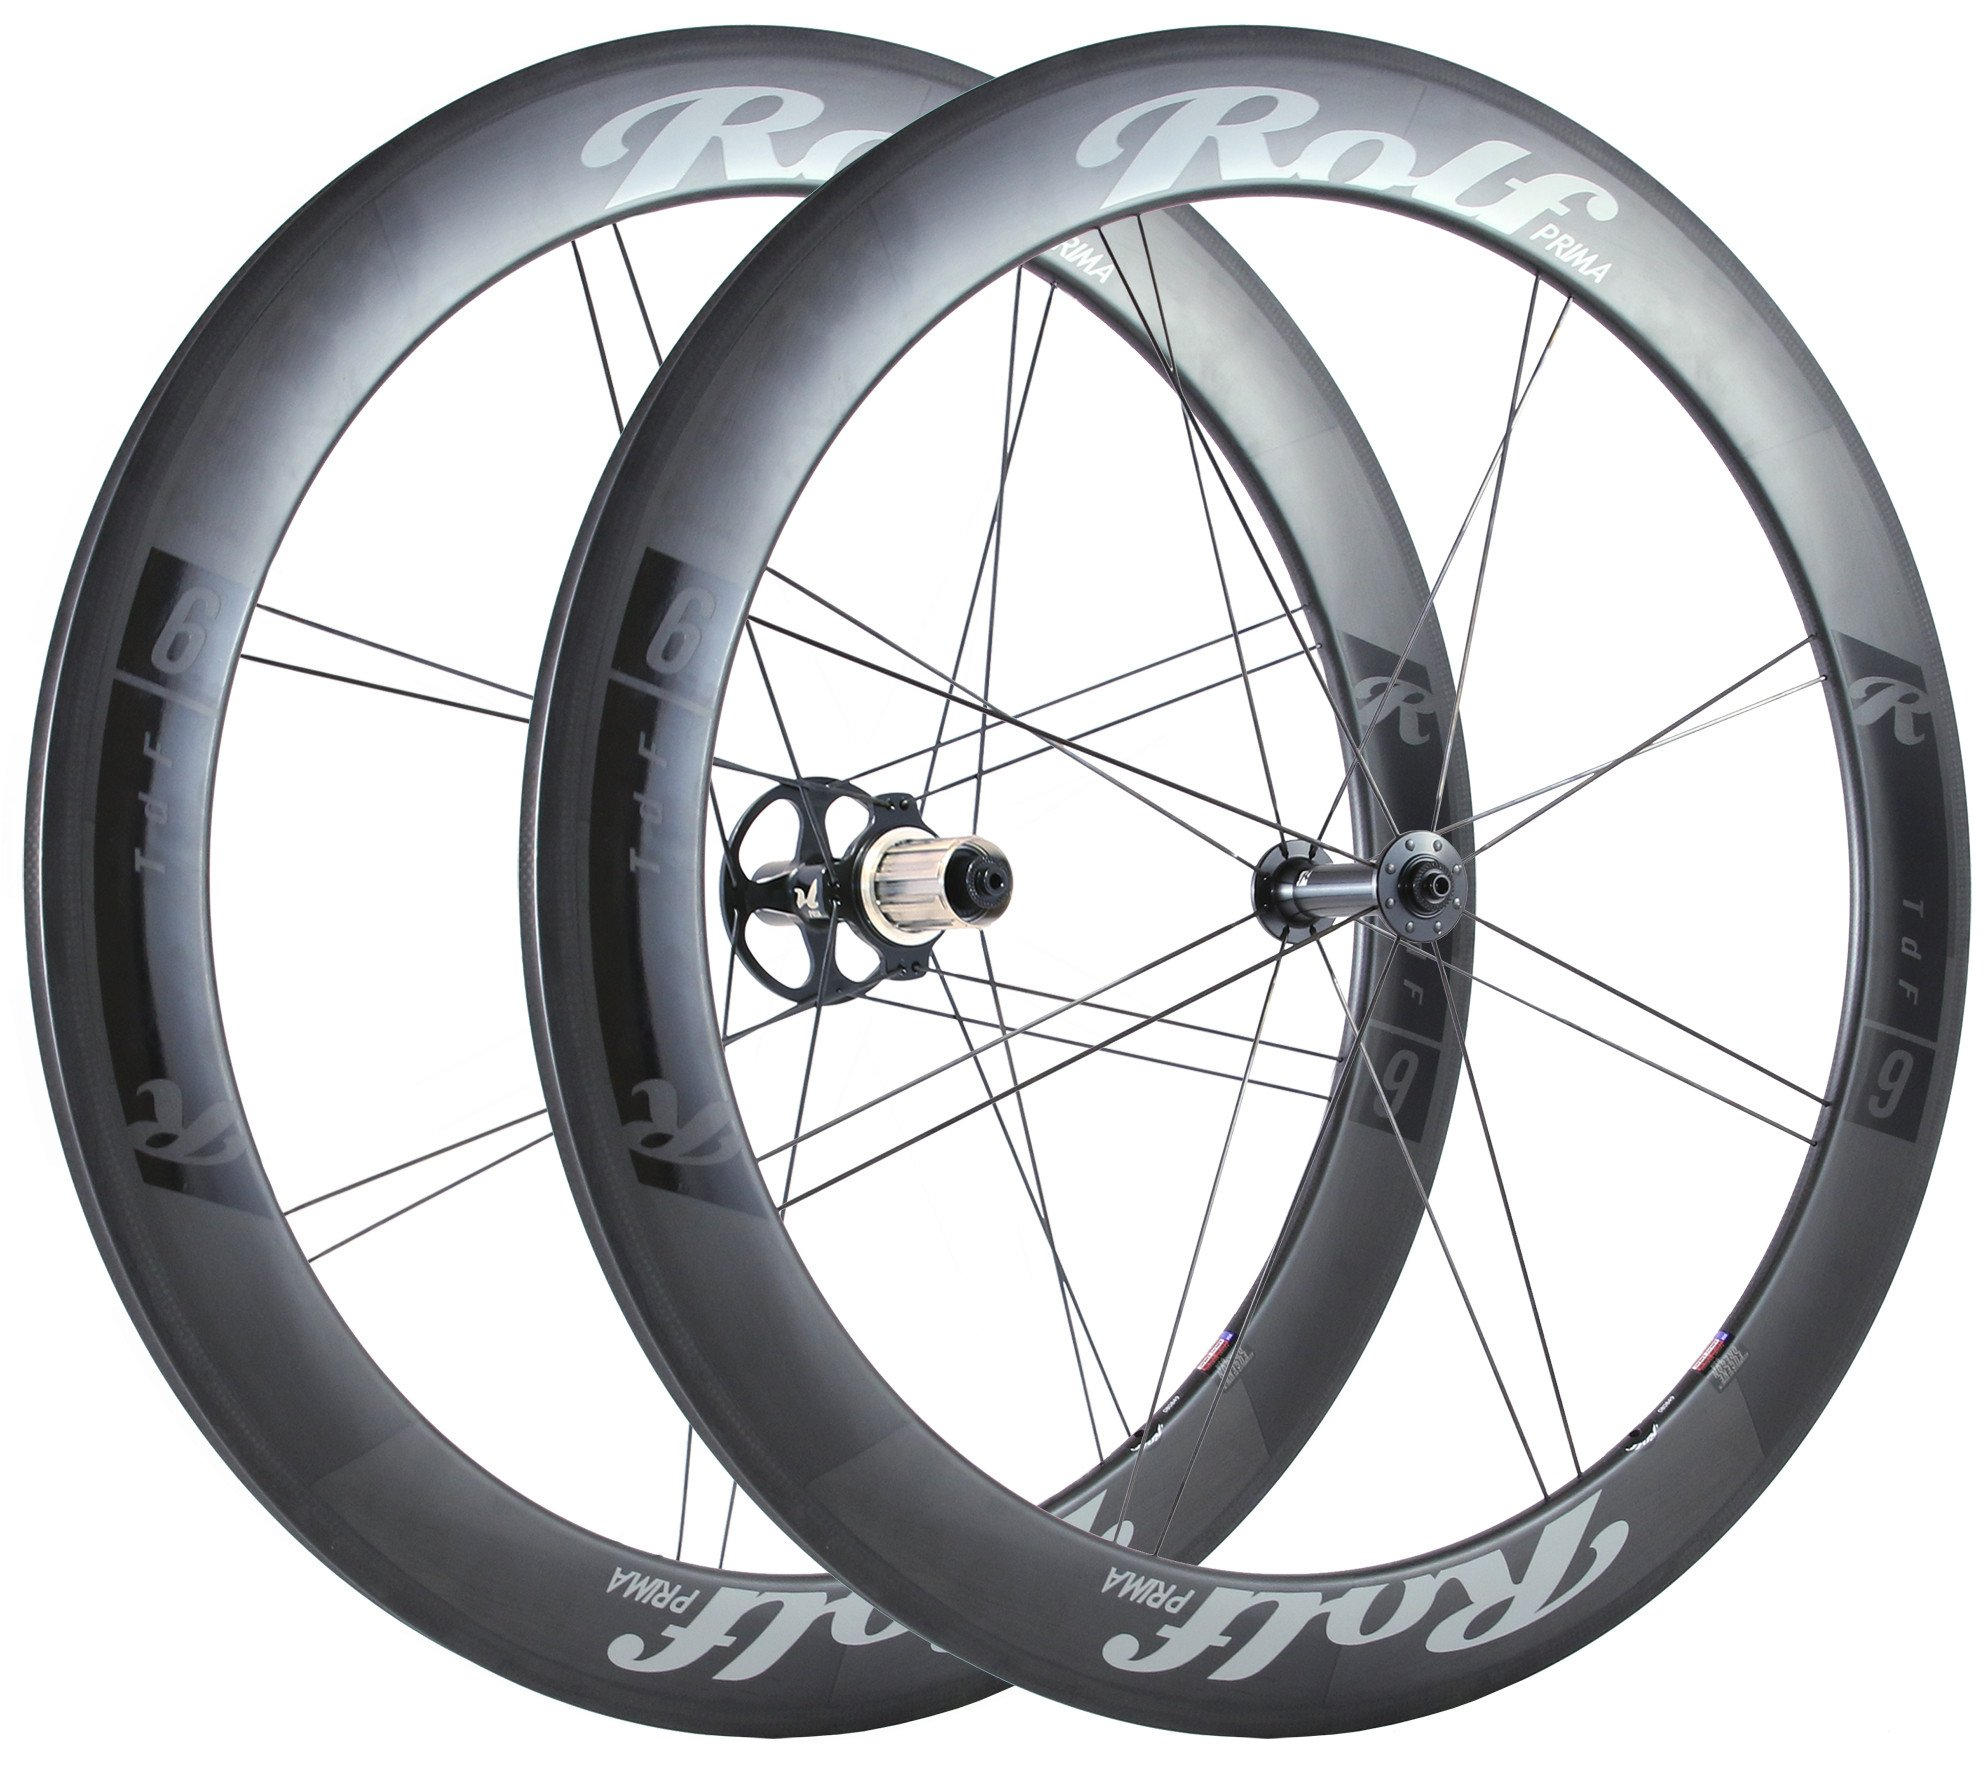 Rolf PRIMA - Carbon TdF6 Rolf PRIMA - Carbon TdF6